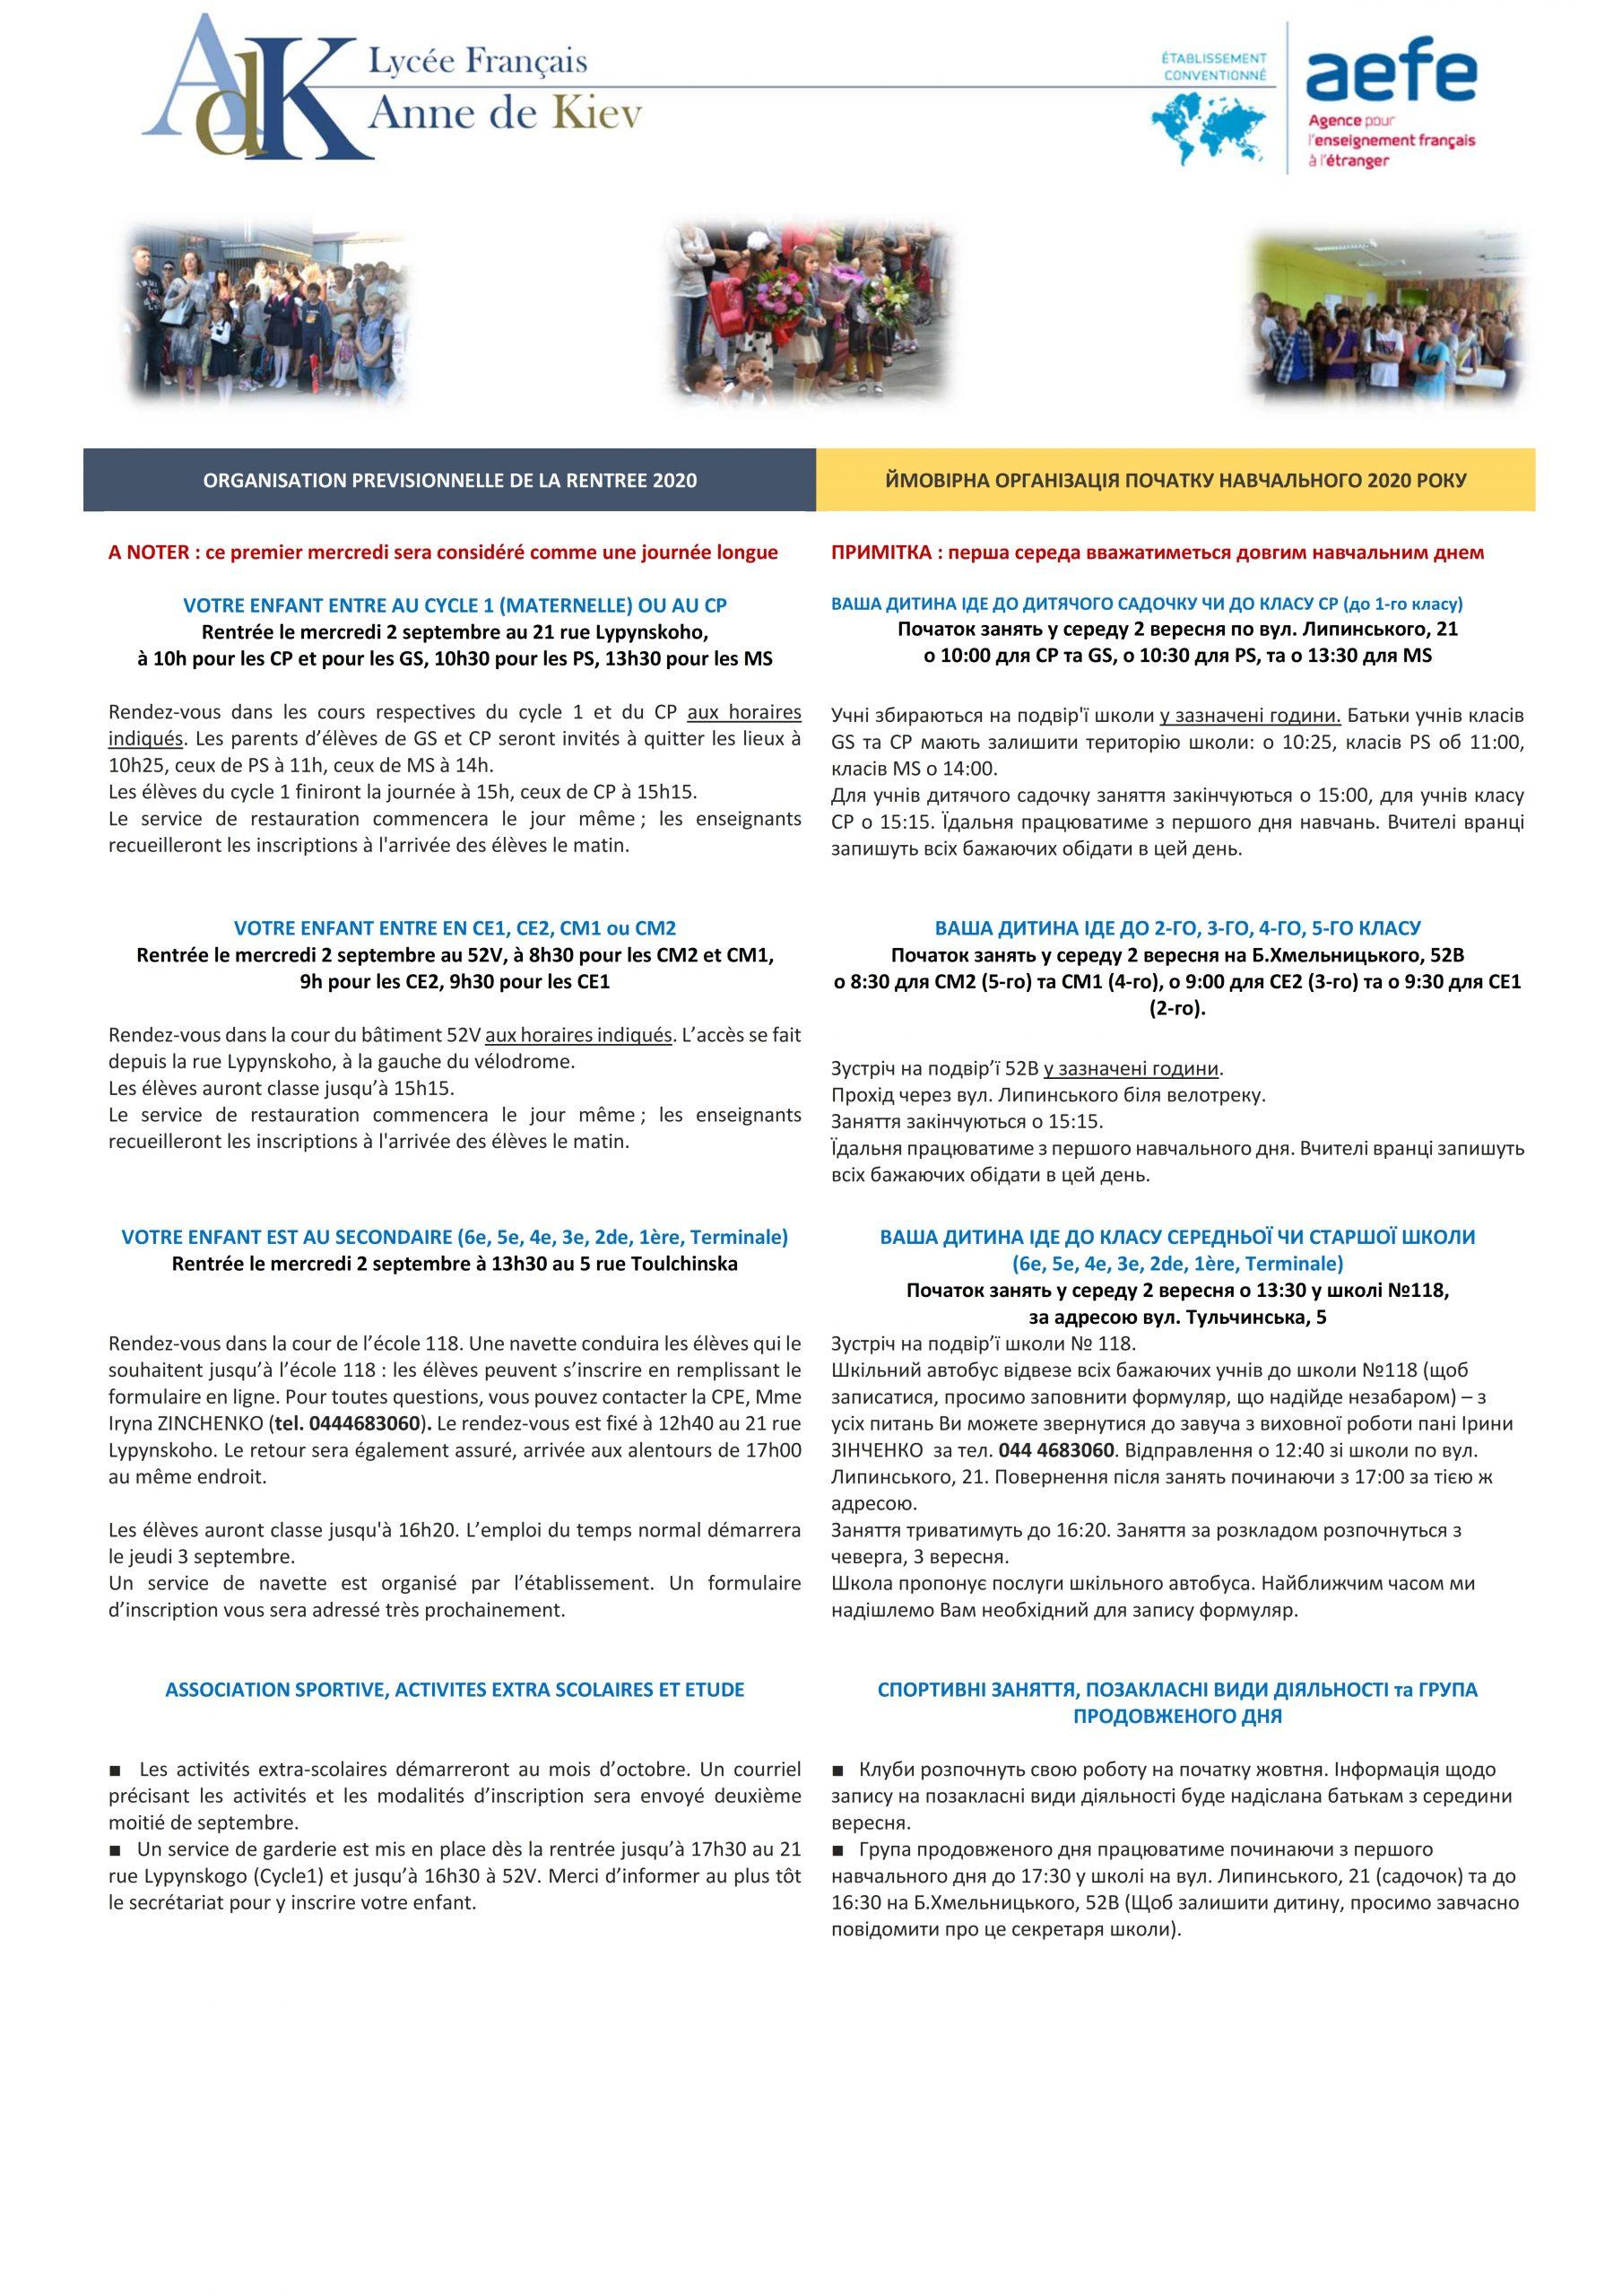 Organisation prévisionnelle de la rentrée 2020-2021 / ЙМОВІРНА ОРГАНІЗАЦІЯ ПОЧАТКУ НАВЧАЛЬНОГО 2020 РОКУ